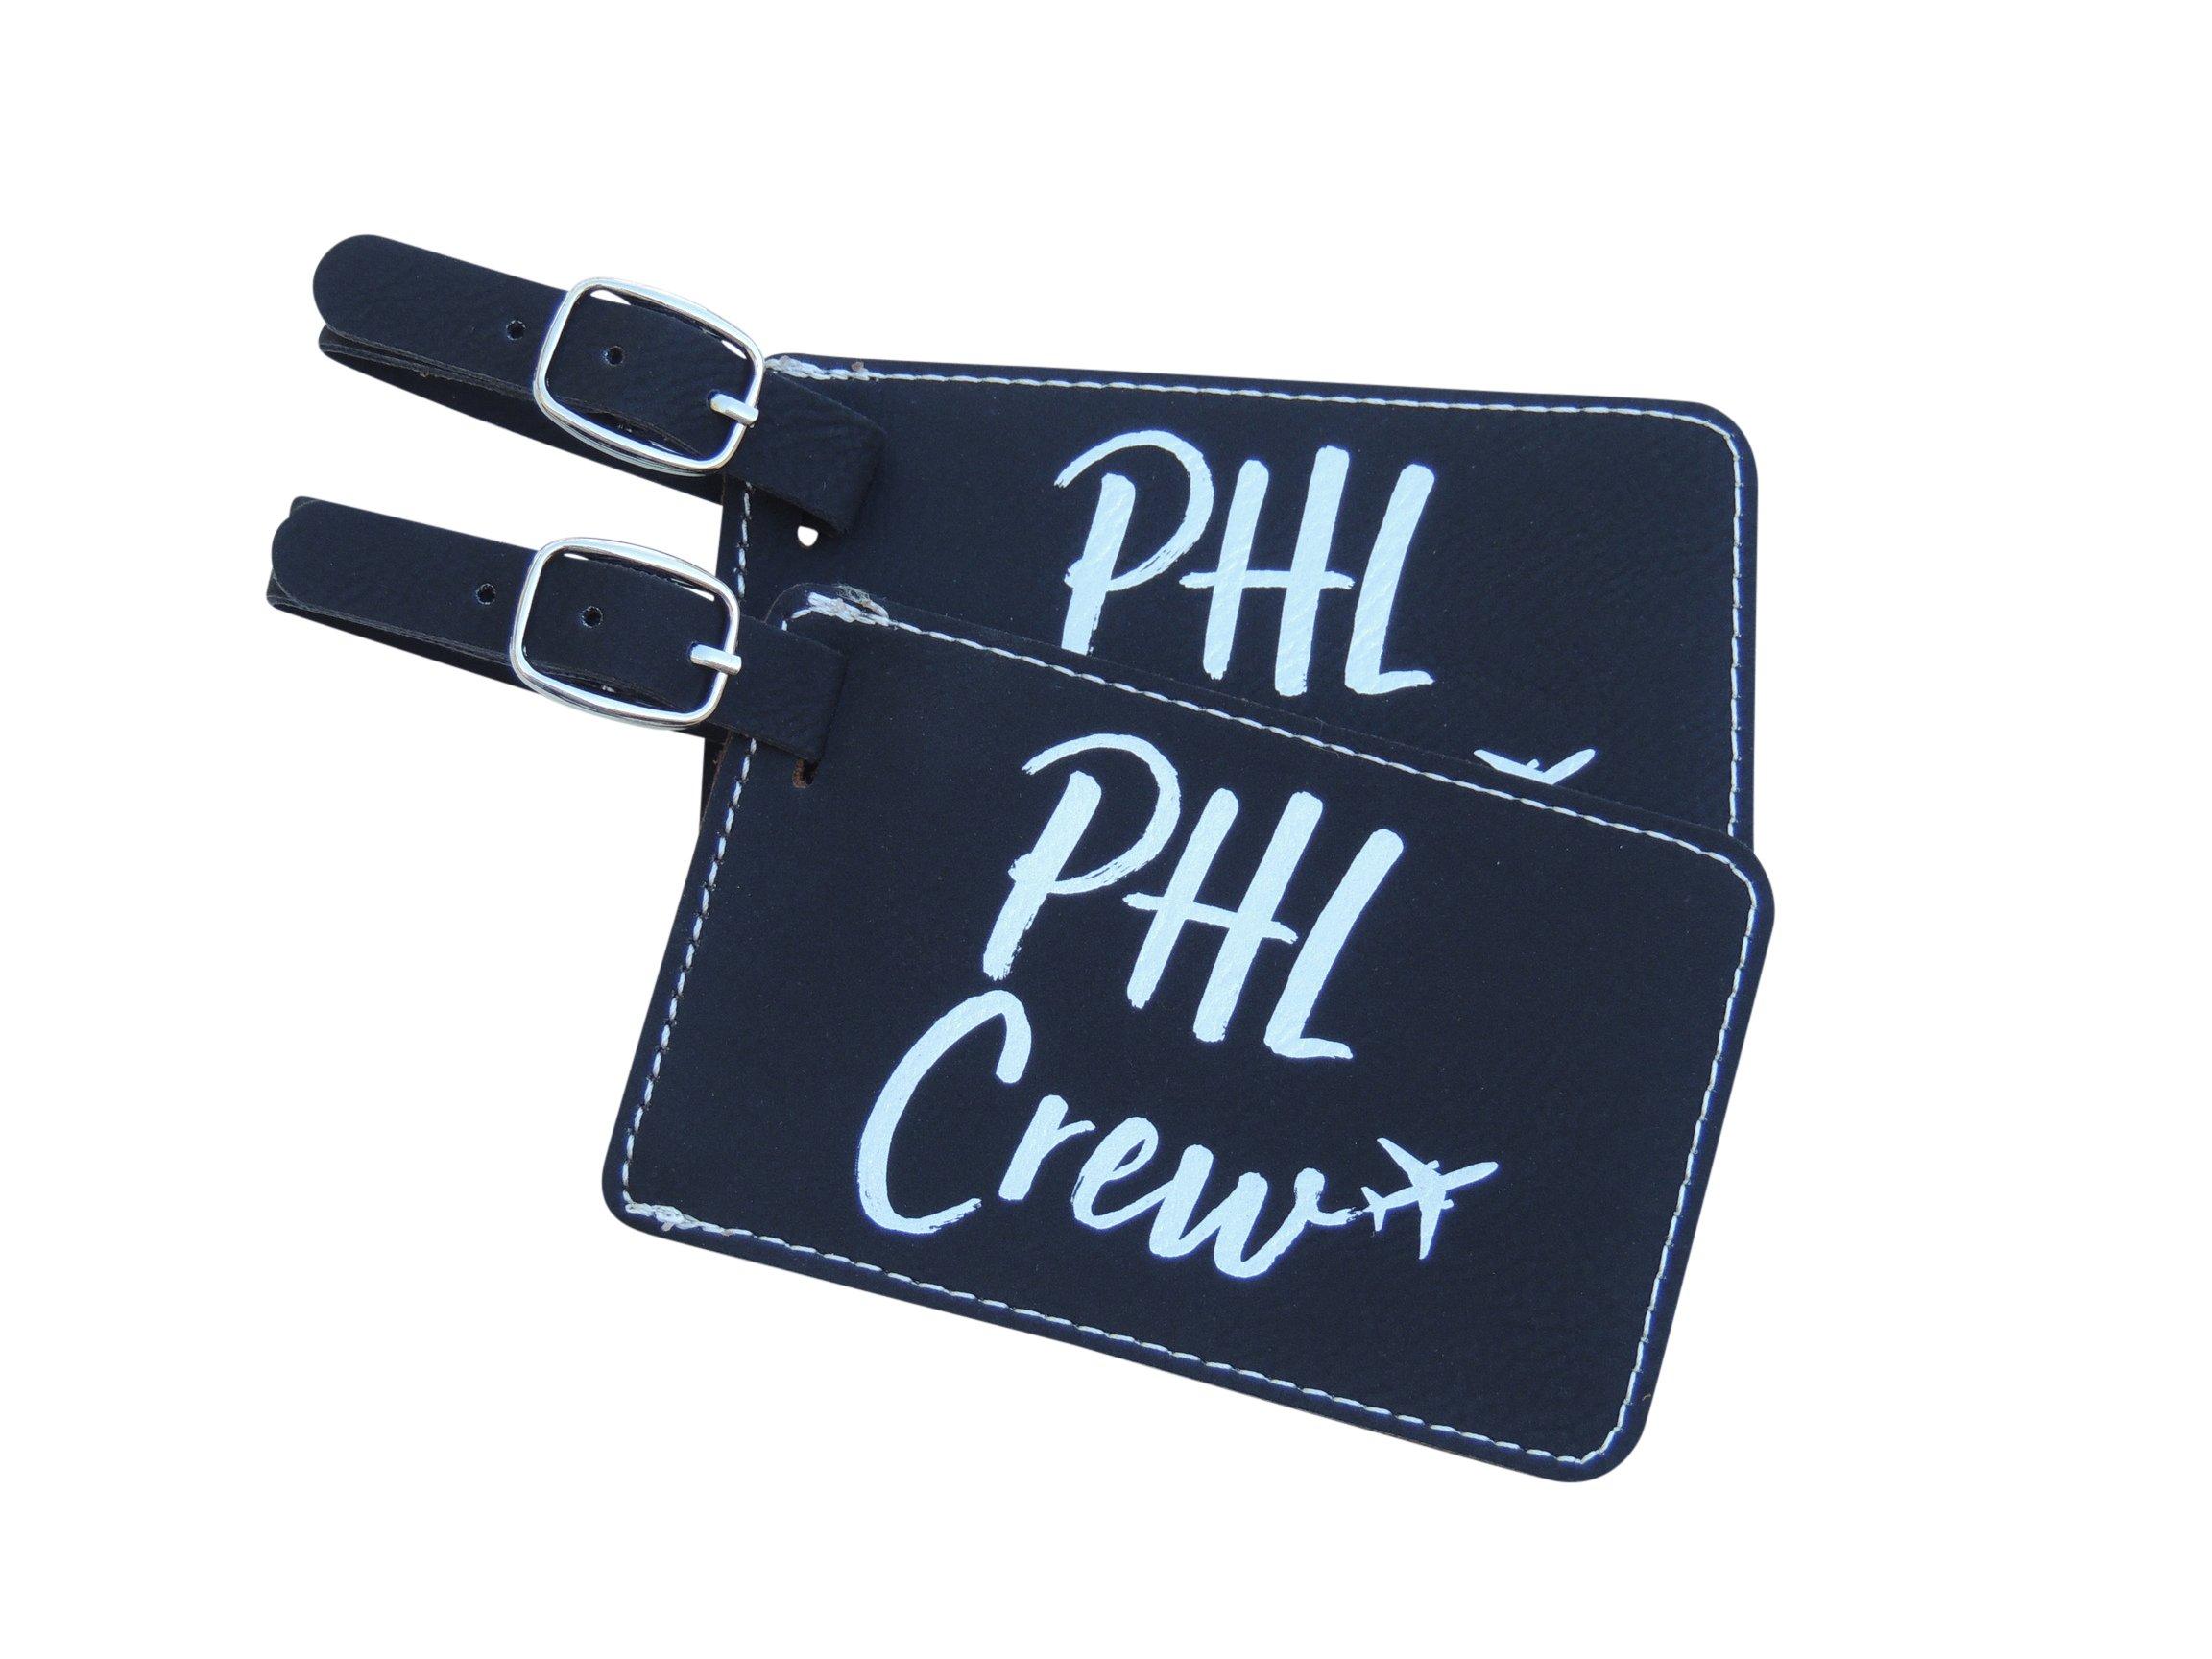 Philadelphia Crew Luggage Tag, American PHL Crew Base Set of Two, (Black)